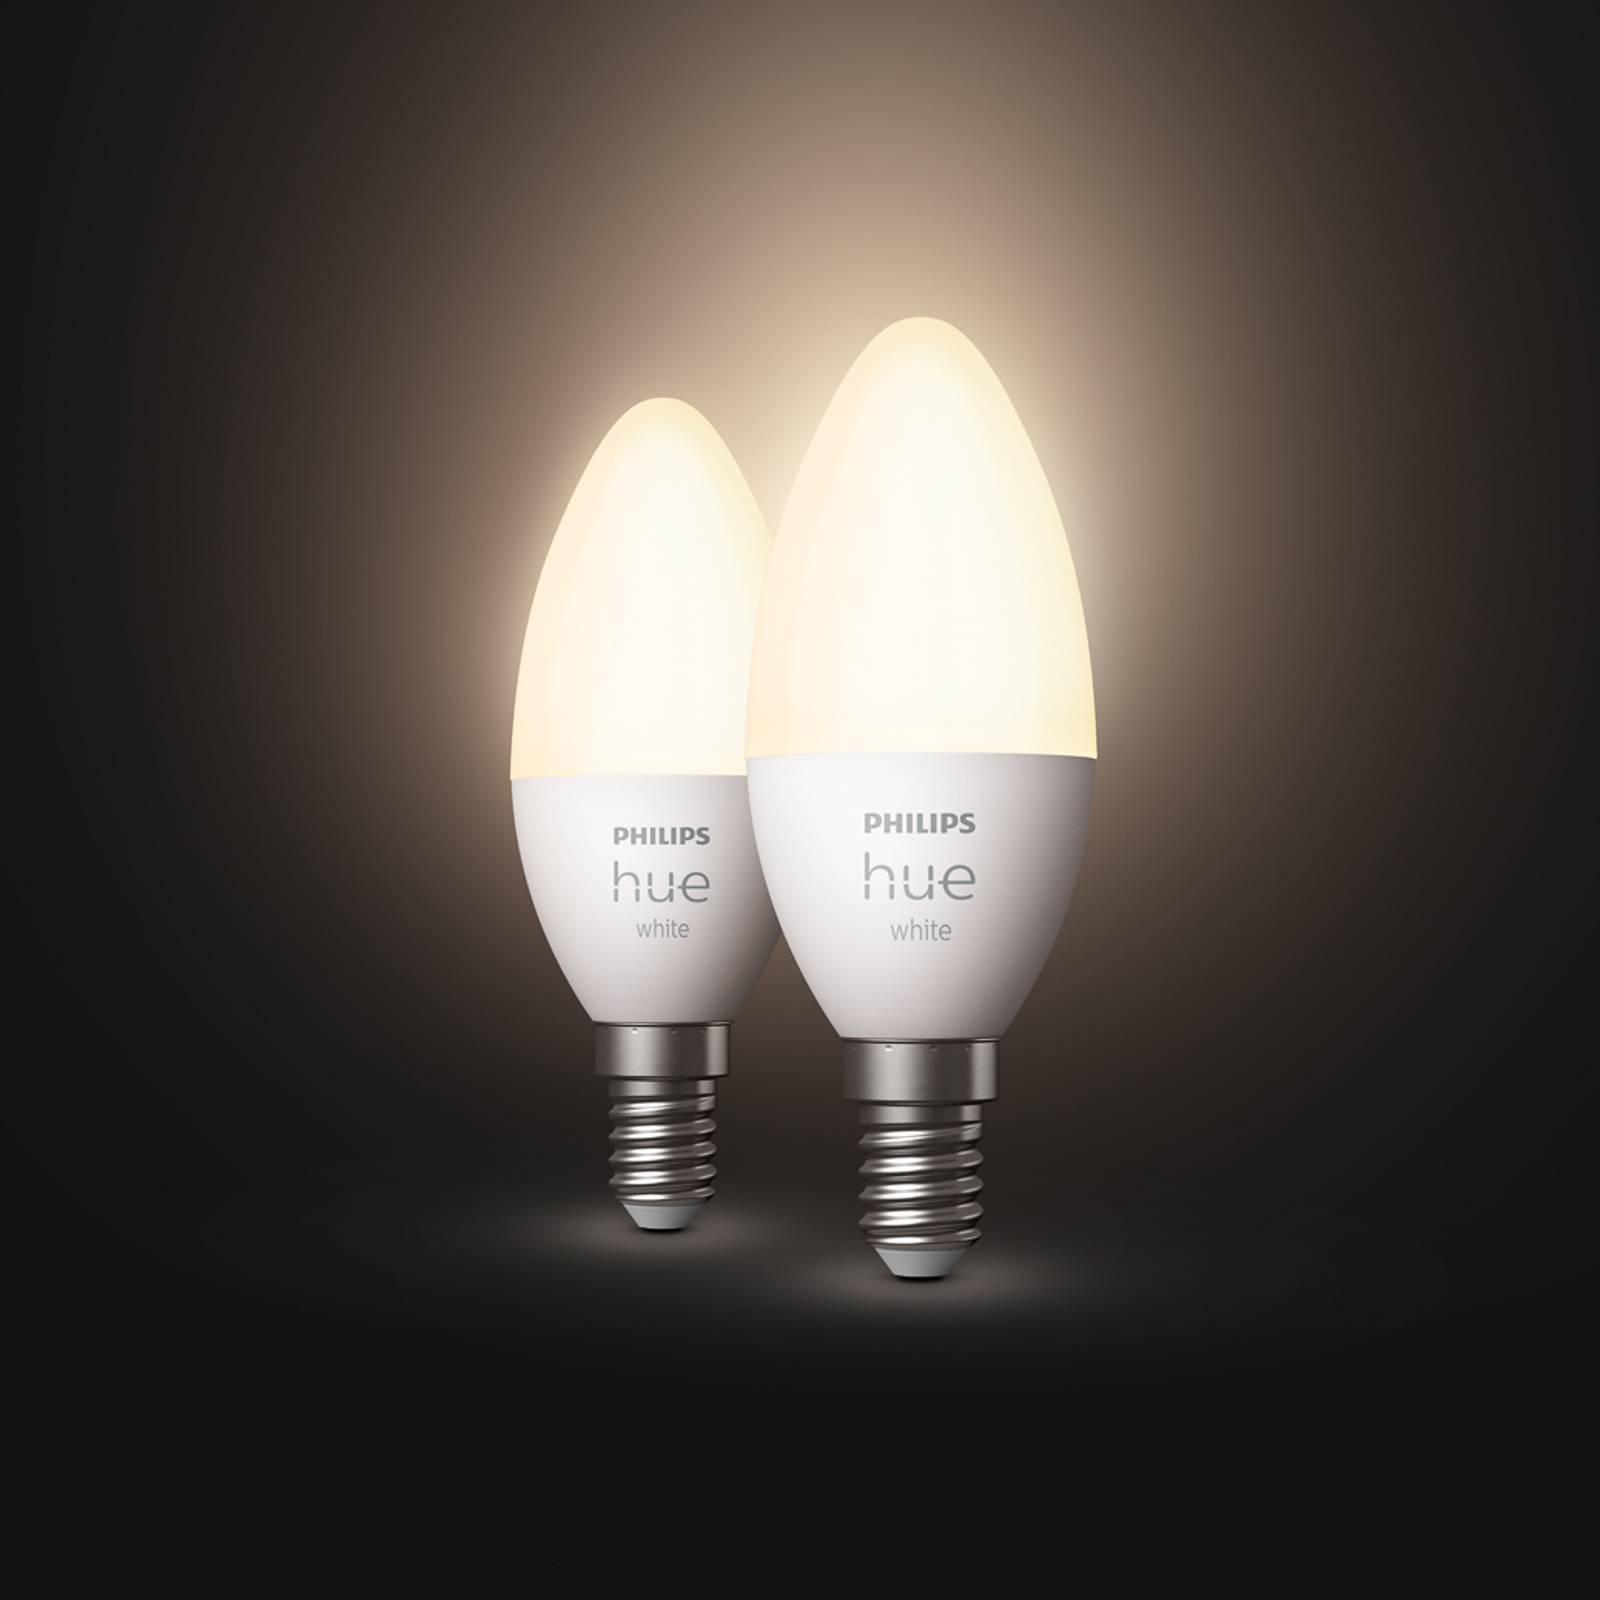 Philips Hue White 5,5W E14 LED-kynttilälamppu 2kpl